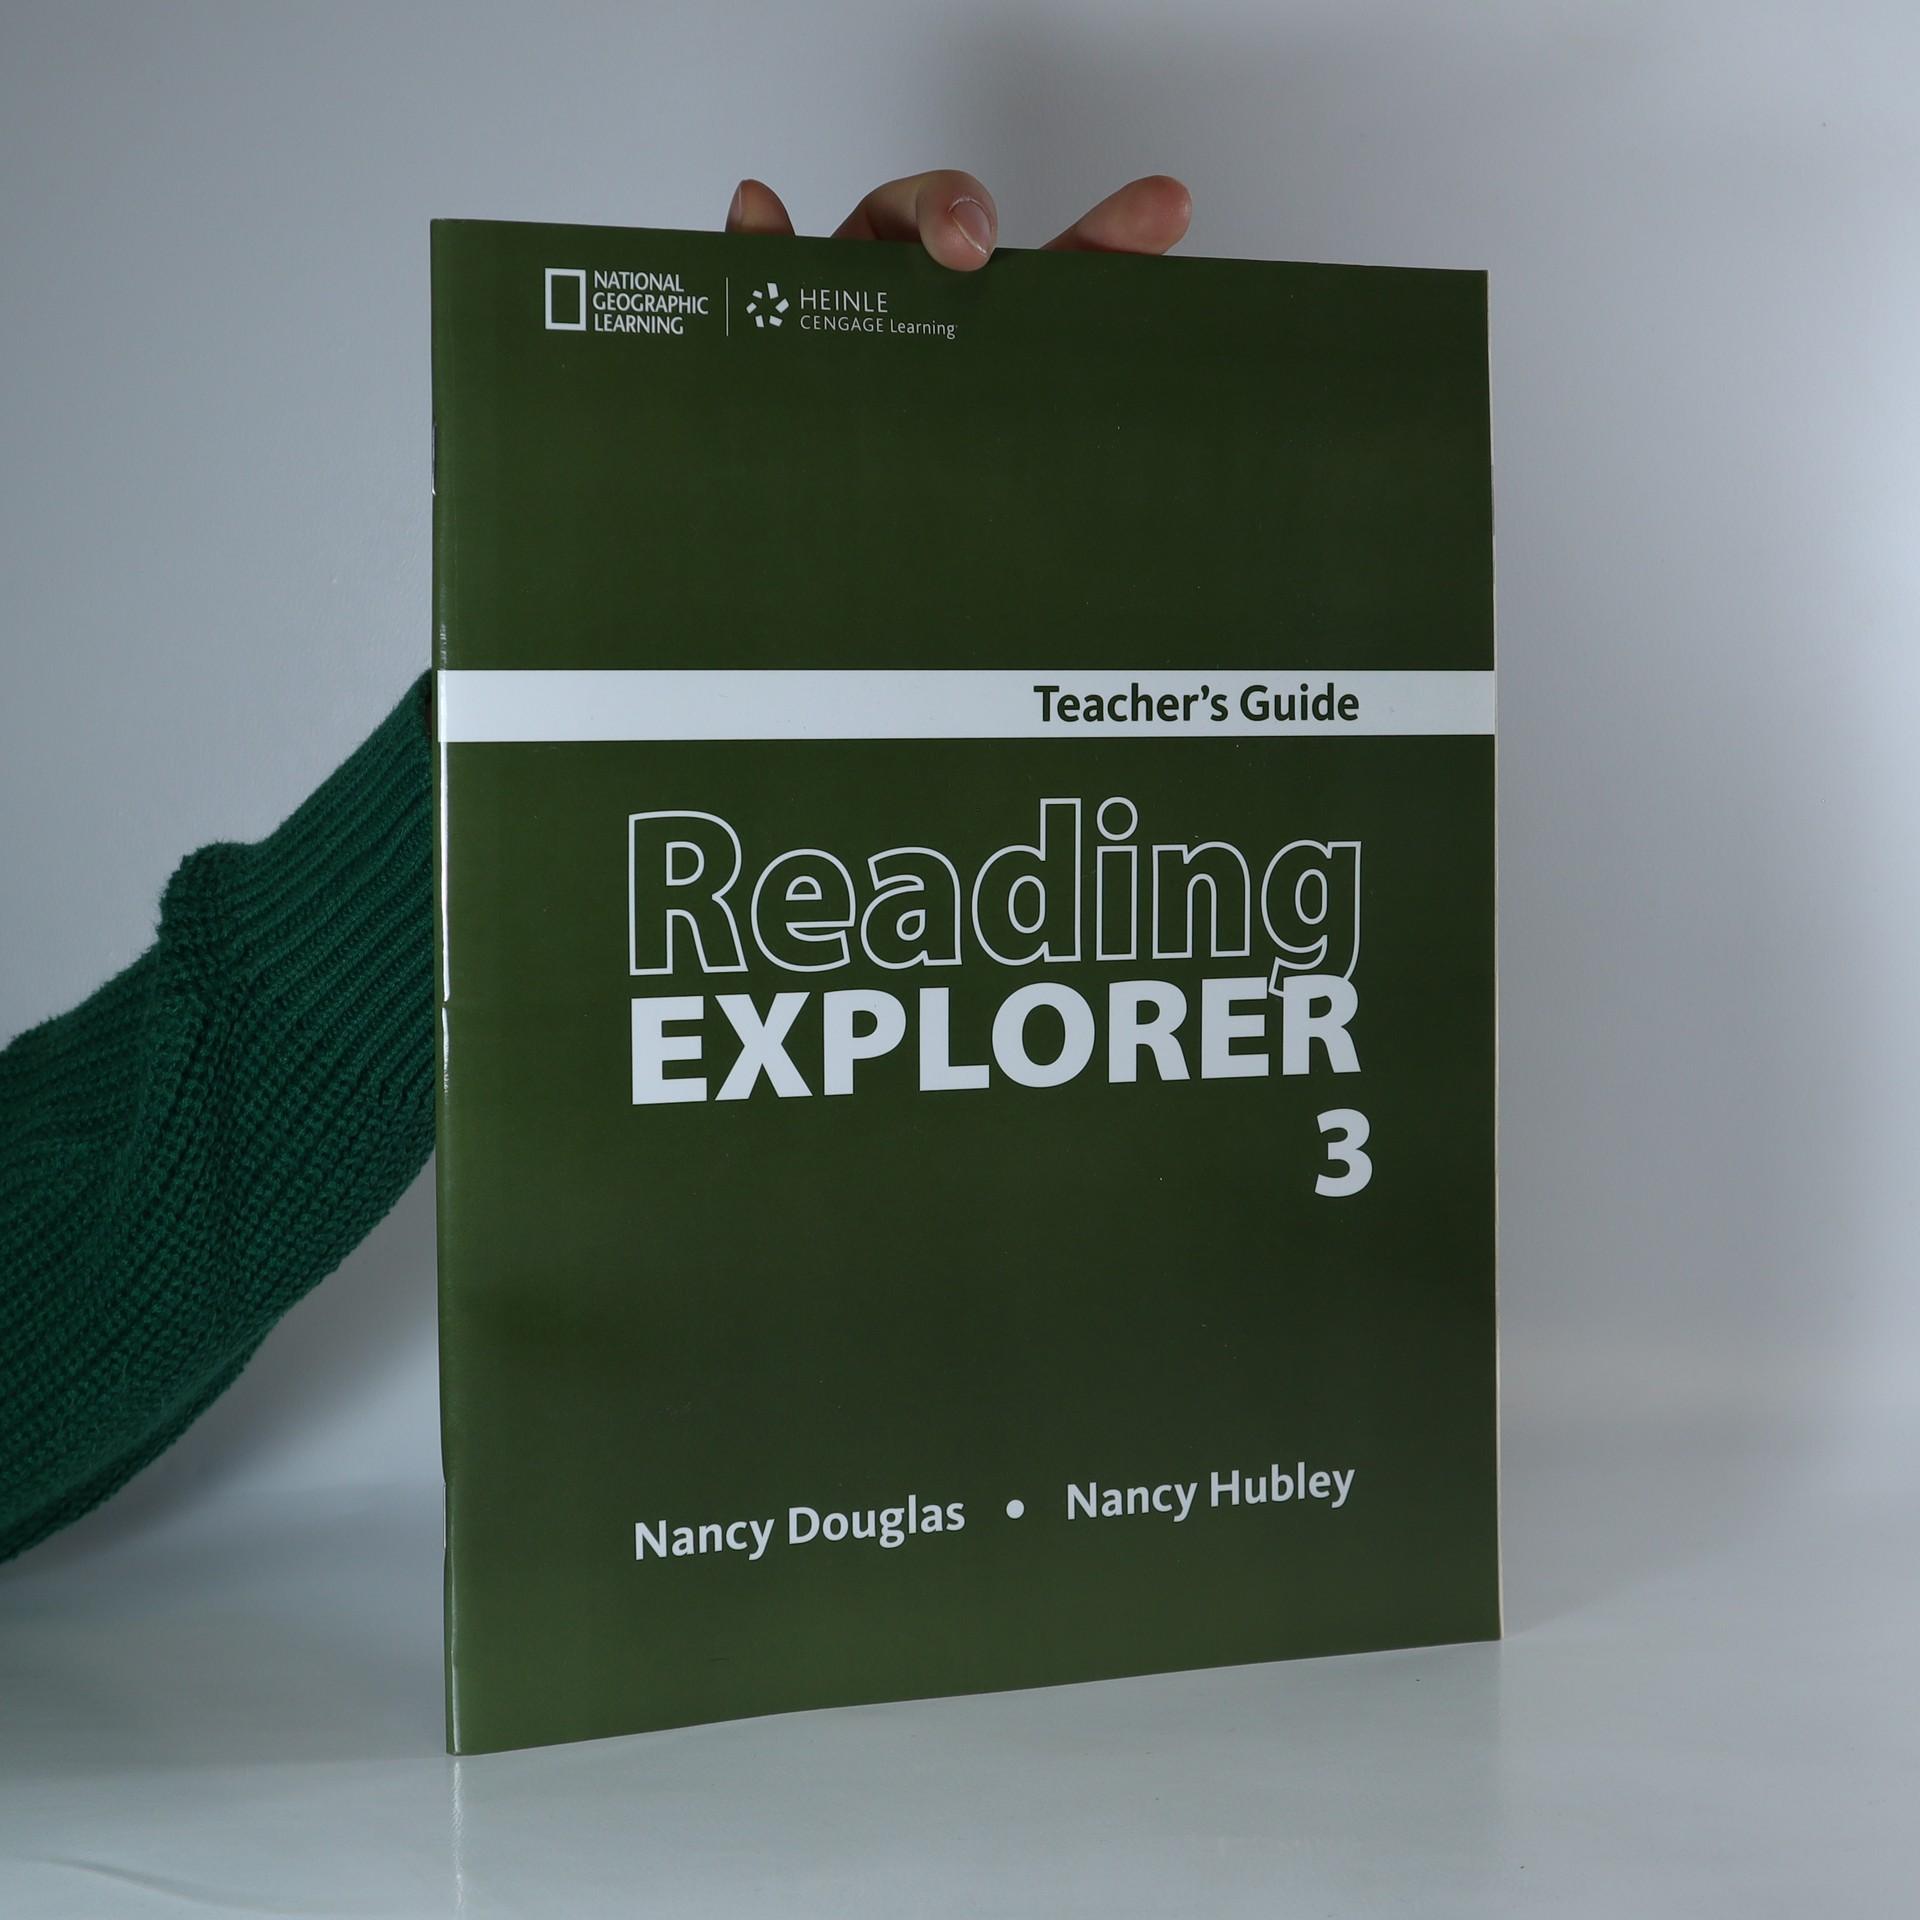 antikvární kniha Reading explorer 3 : teacher's guide, 2009